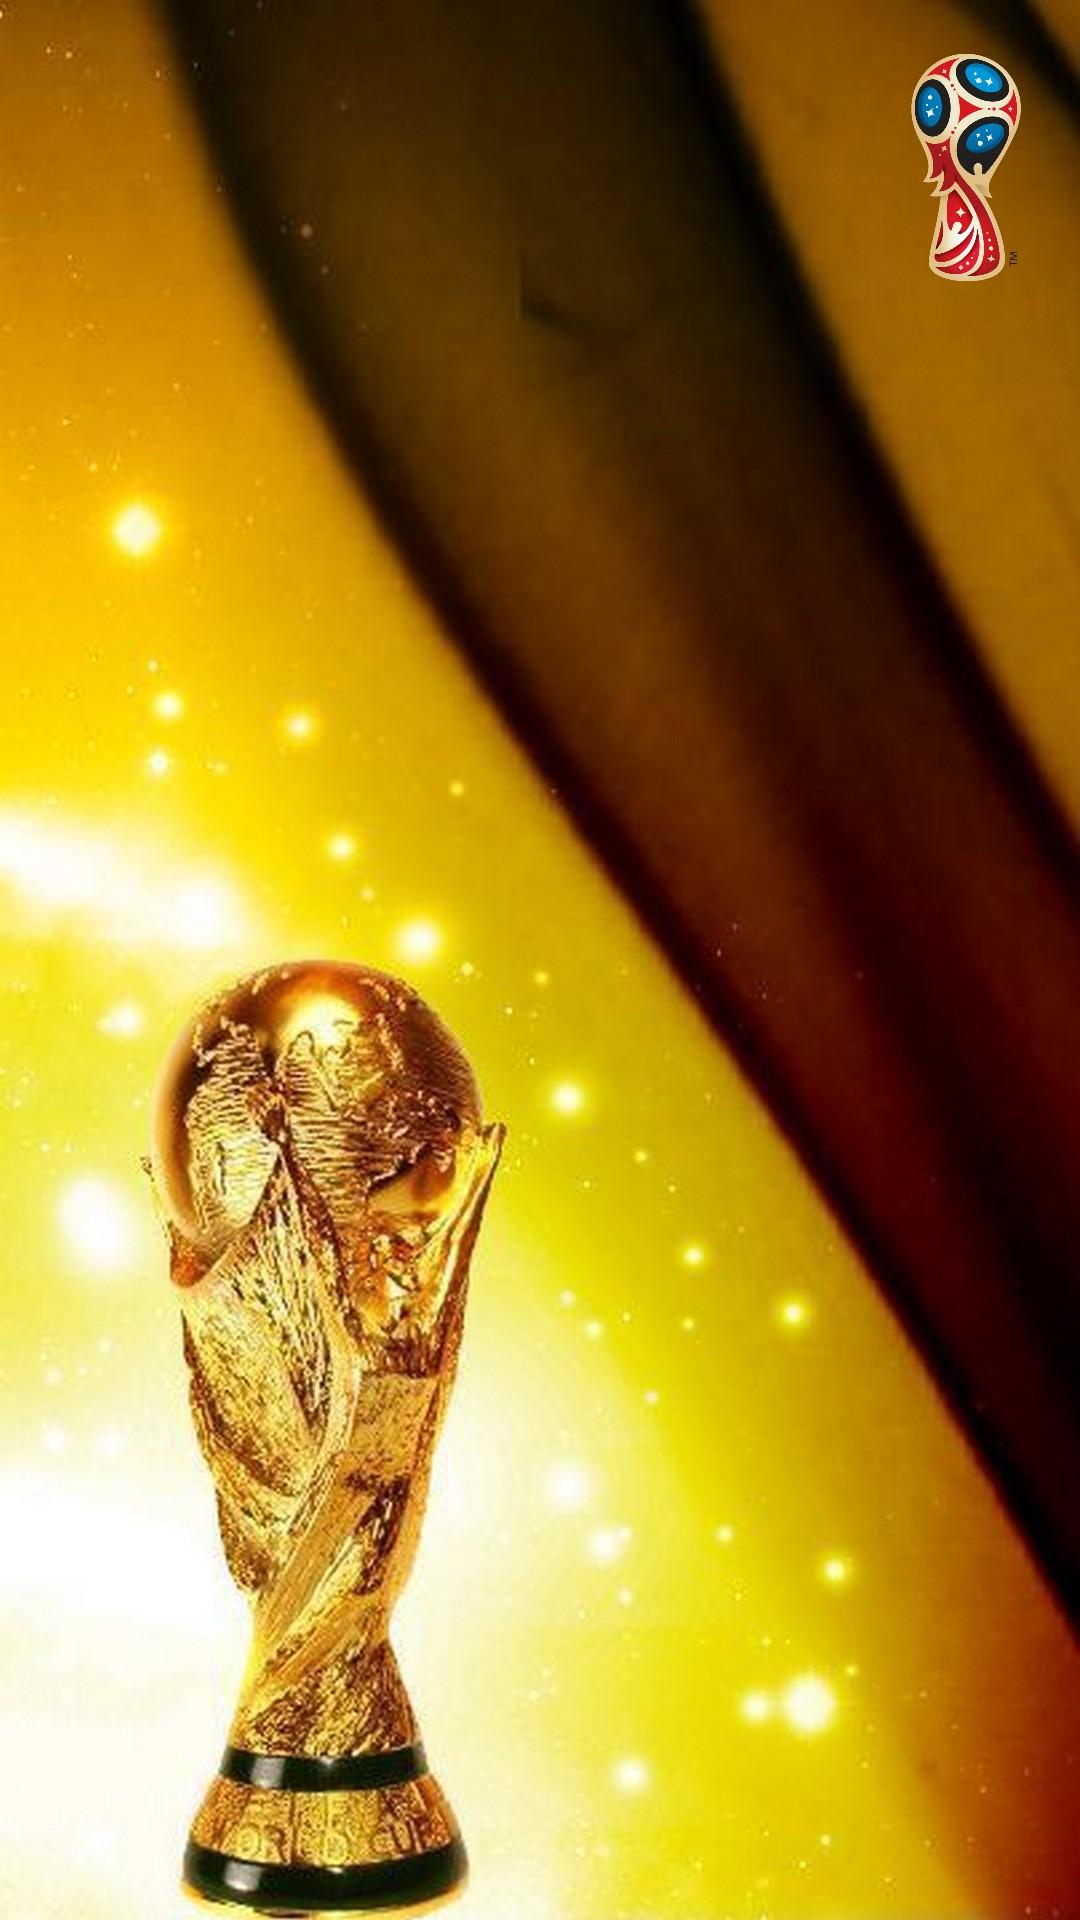 iPhone Wallpaper HD FIFA World Cup 2021 Football Wallpaper 1080x1920